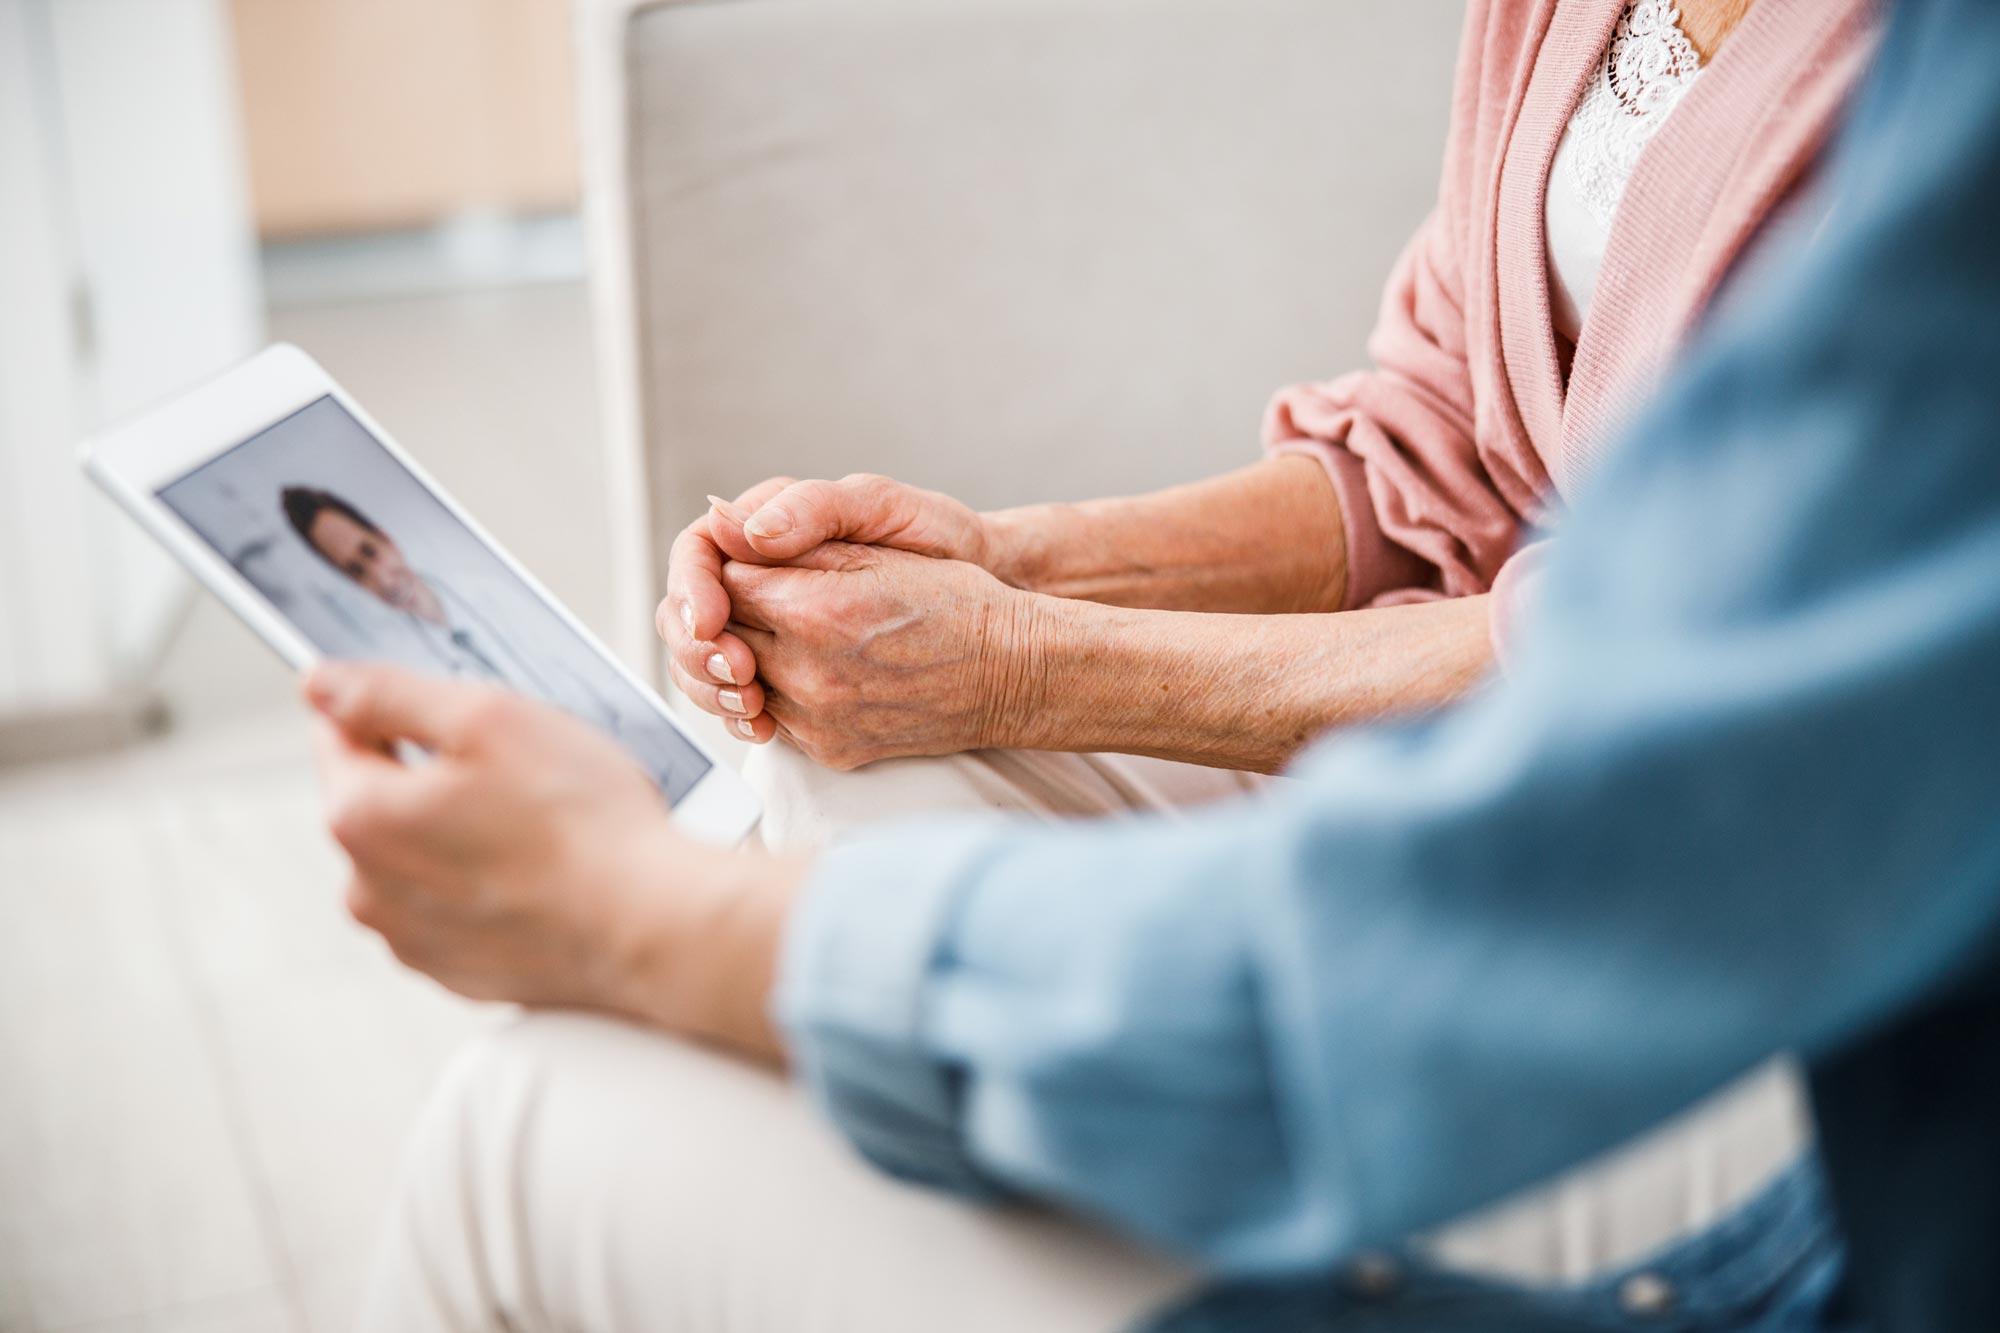 $4.4 Million Grant to Boost UVA Health's Home Monitoring Services